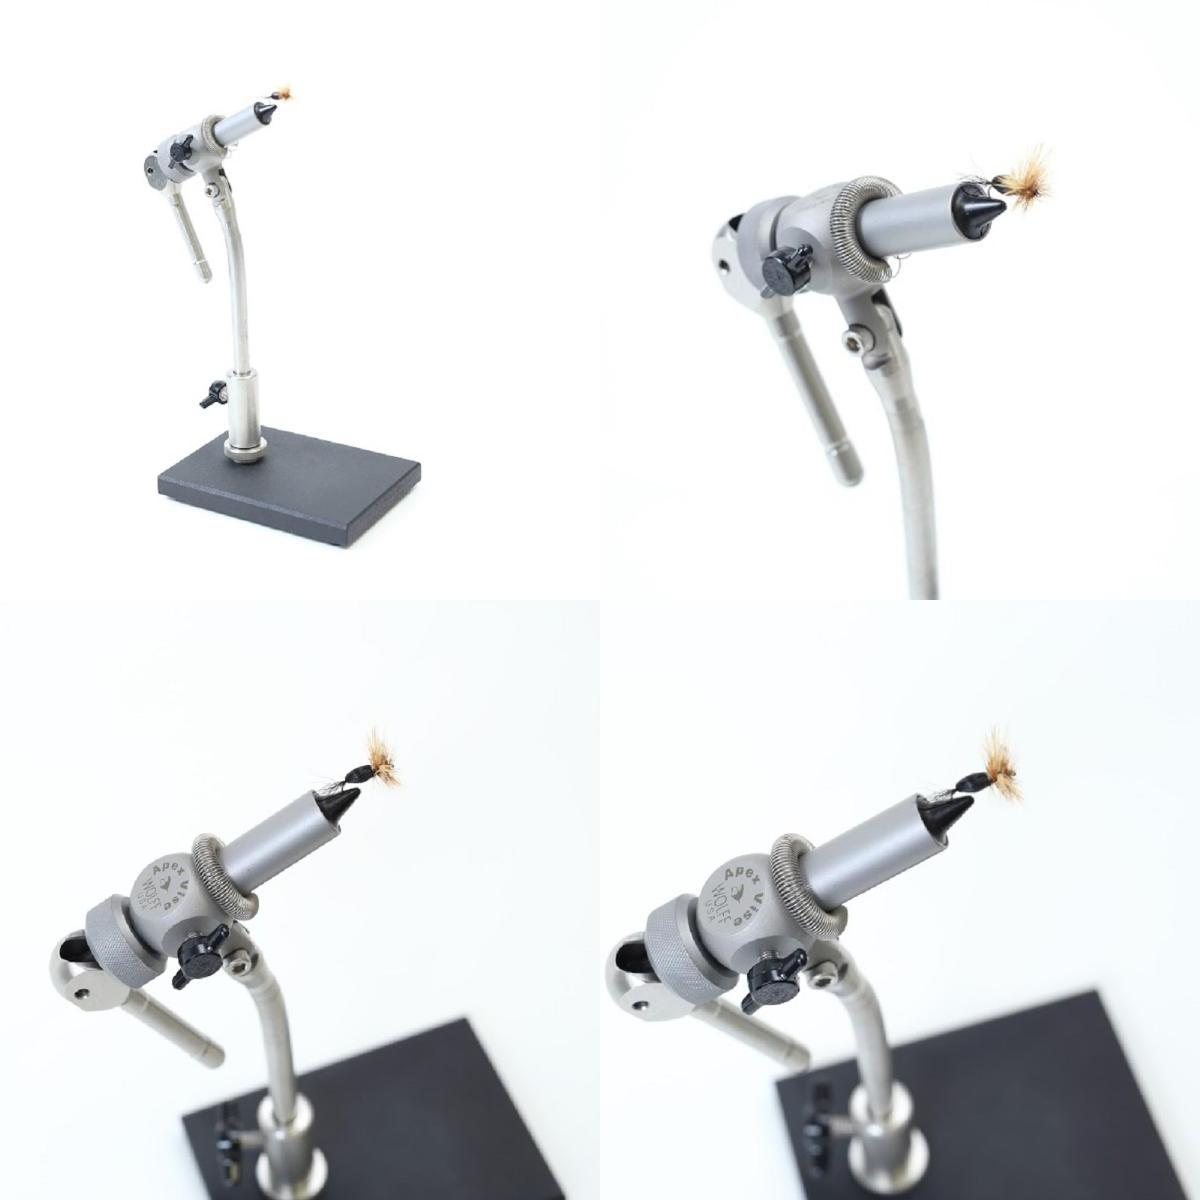 Tiemco (TIEMCO) anvil-Apex buys